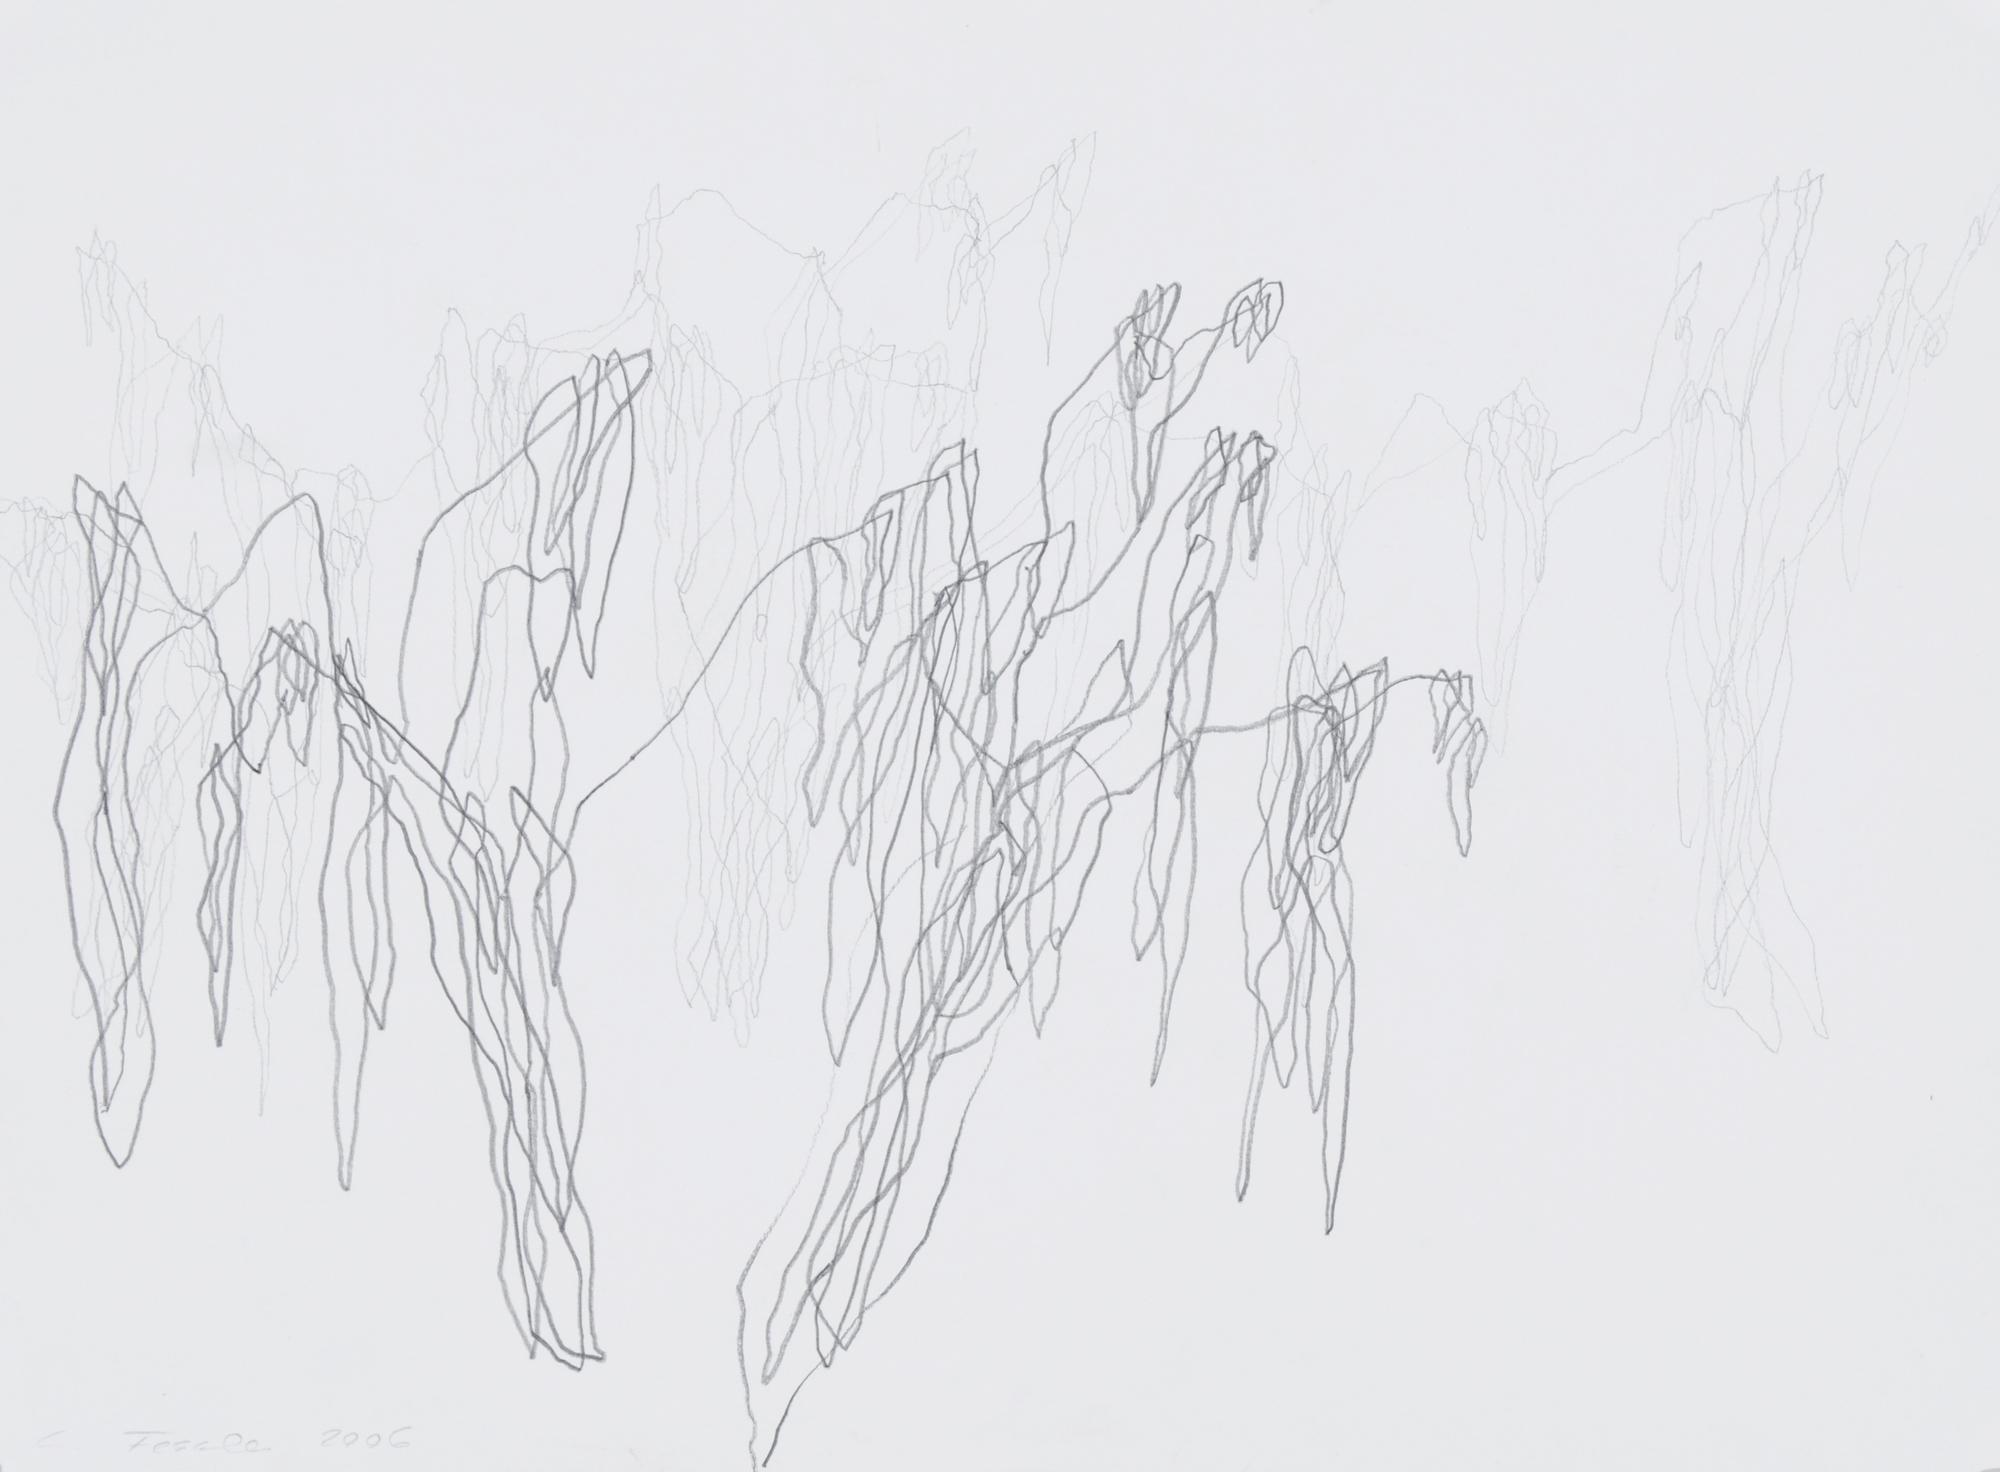 Fessler Cristina, 2 drawings: Banyan Tree, 2006; Pipal Tree